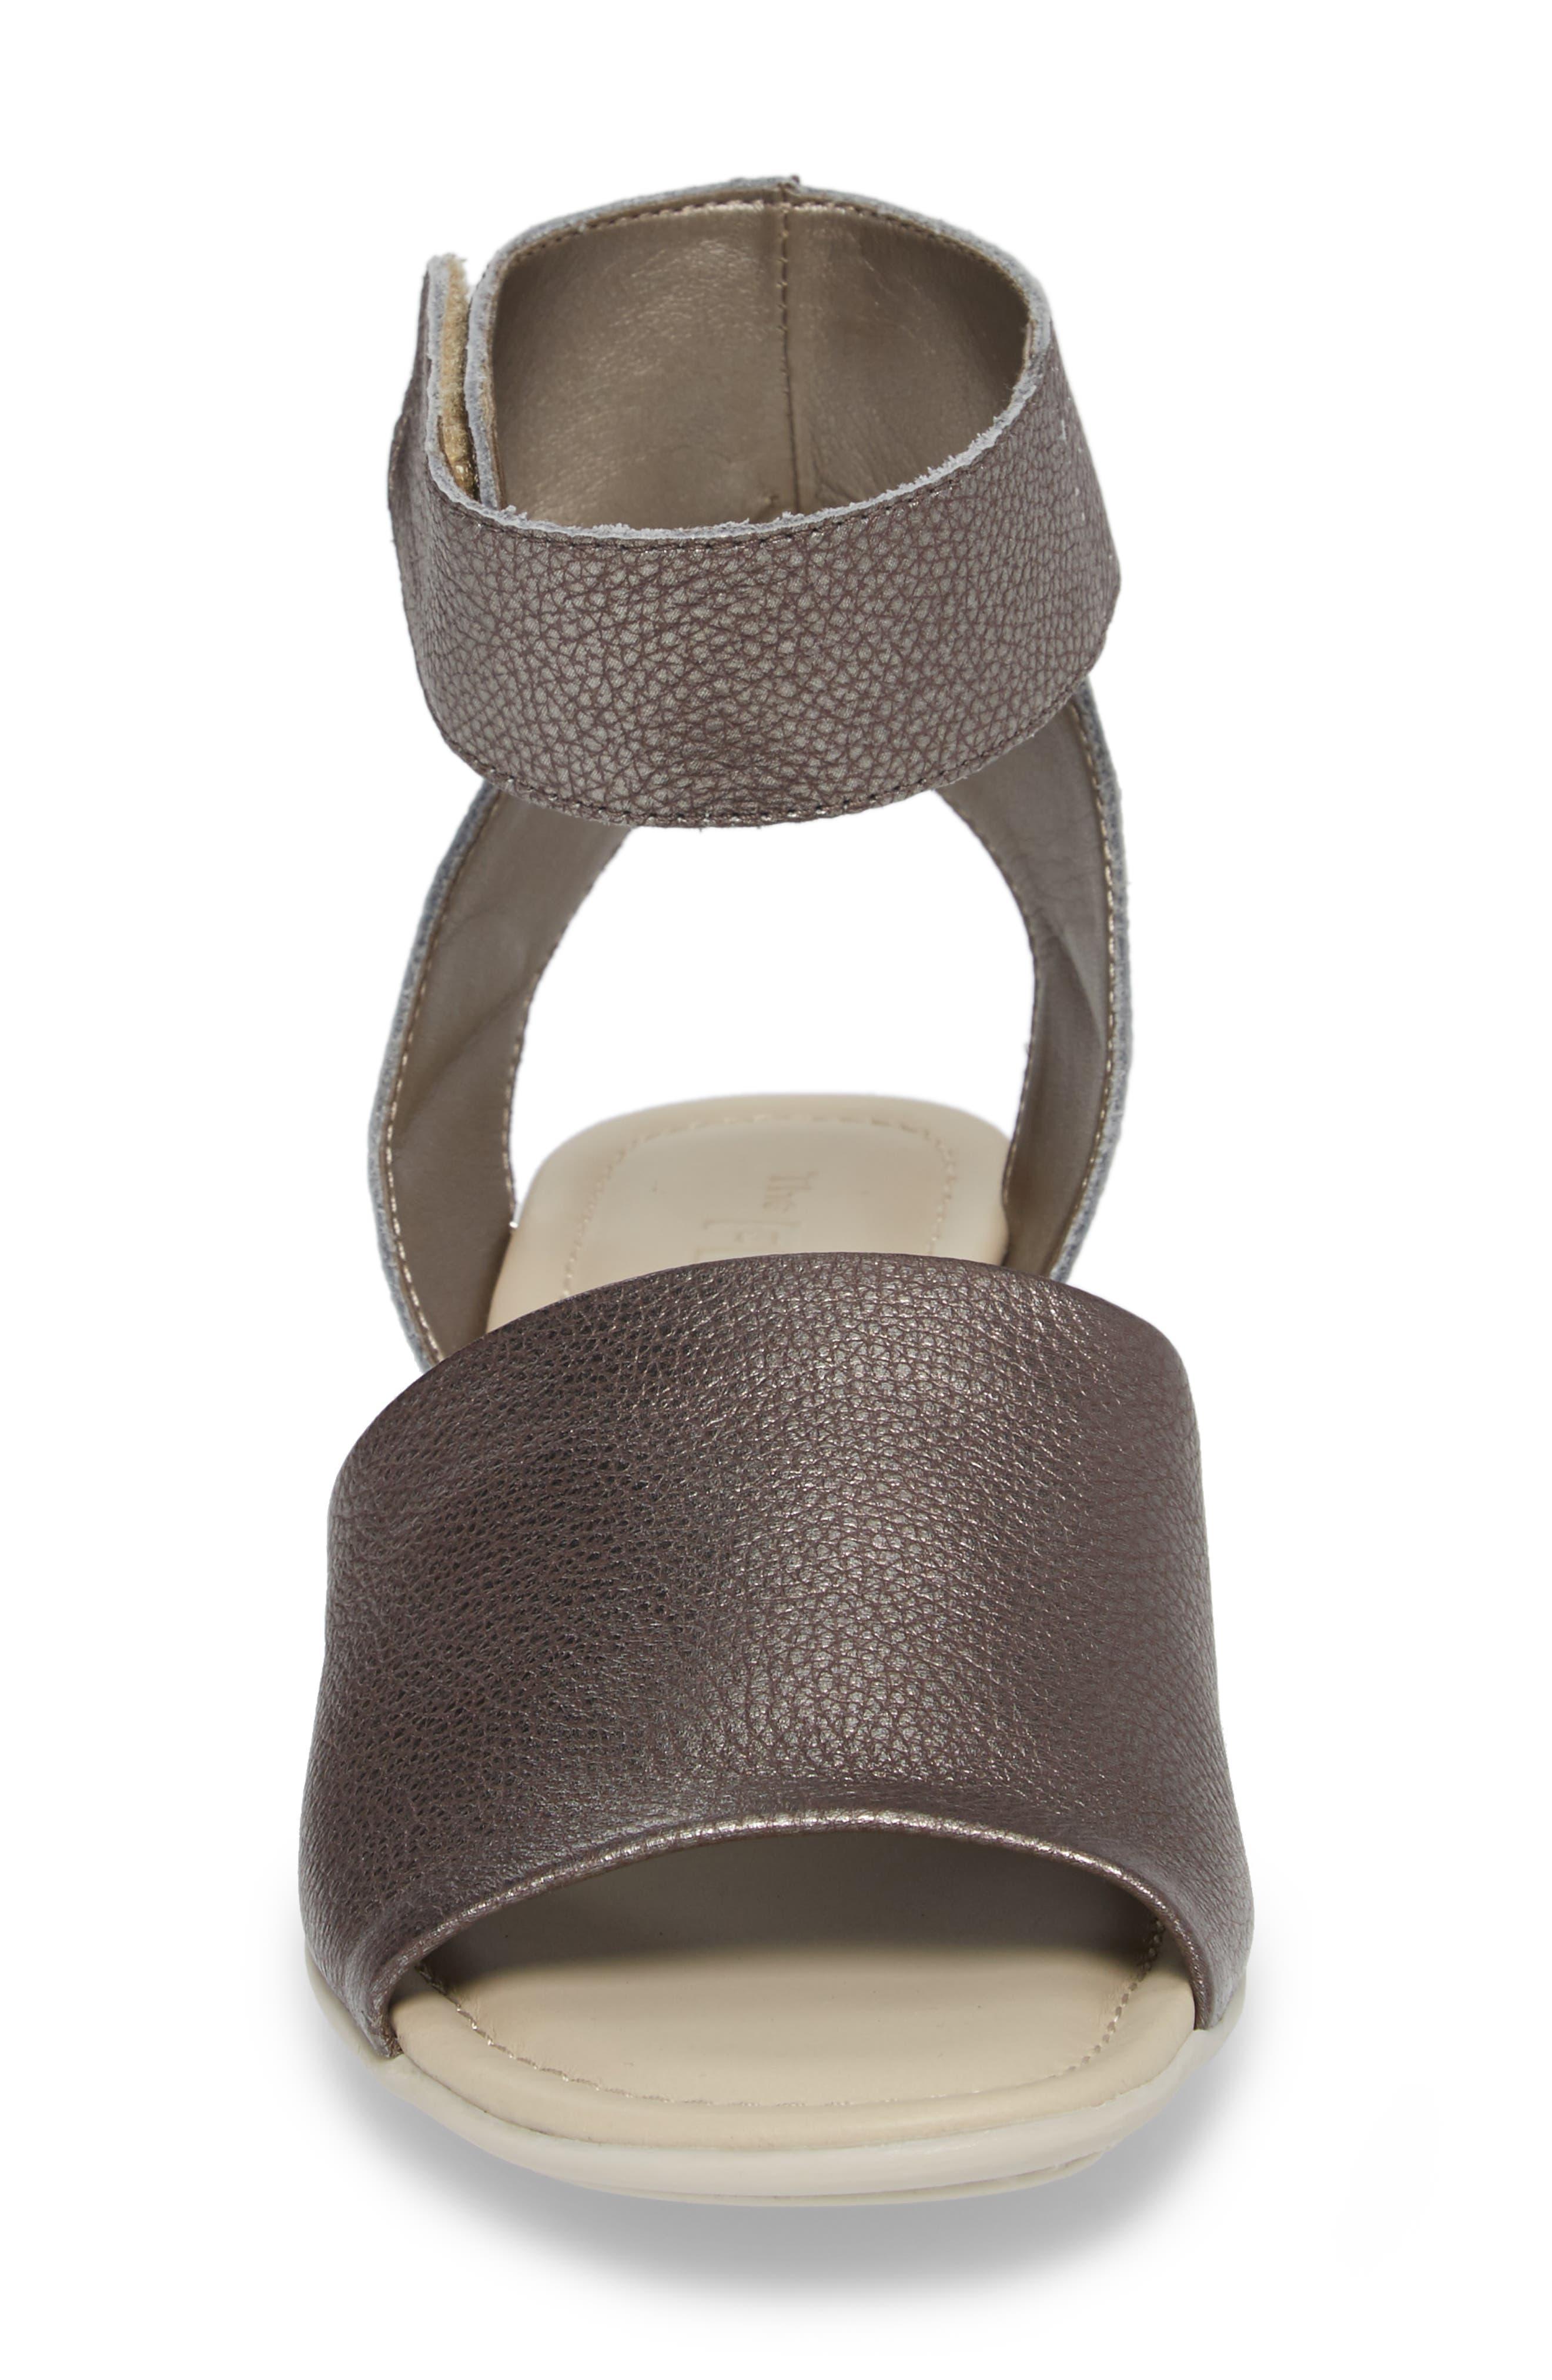 'Beglad' Leather Ankle Strap Sandal,                             Alternate thumbnail 50, color,